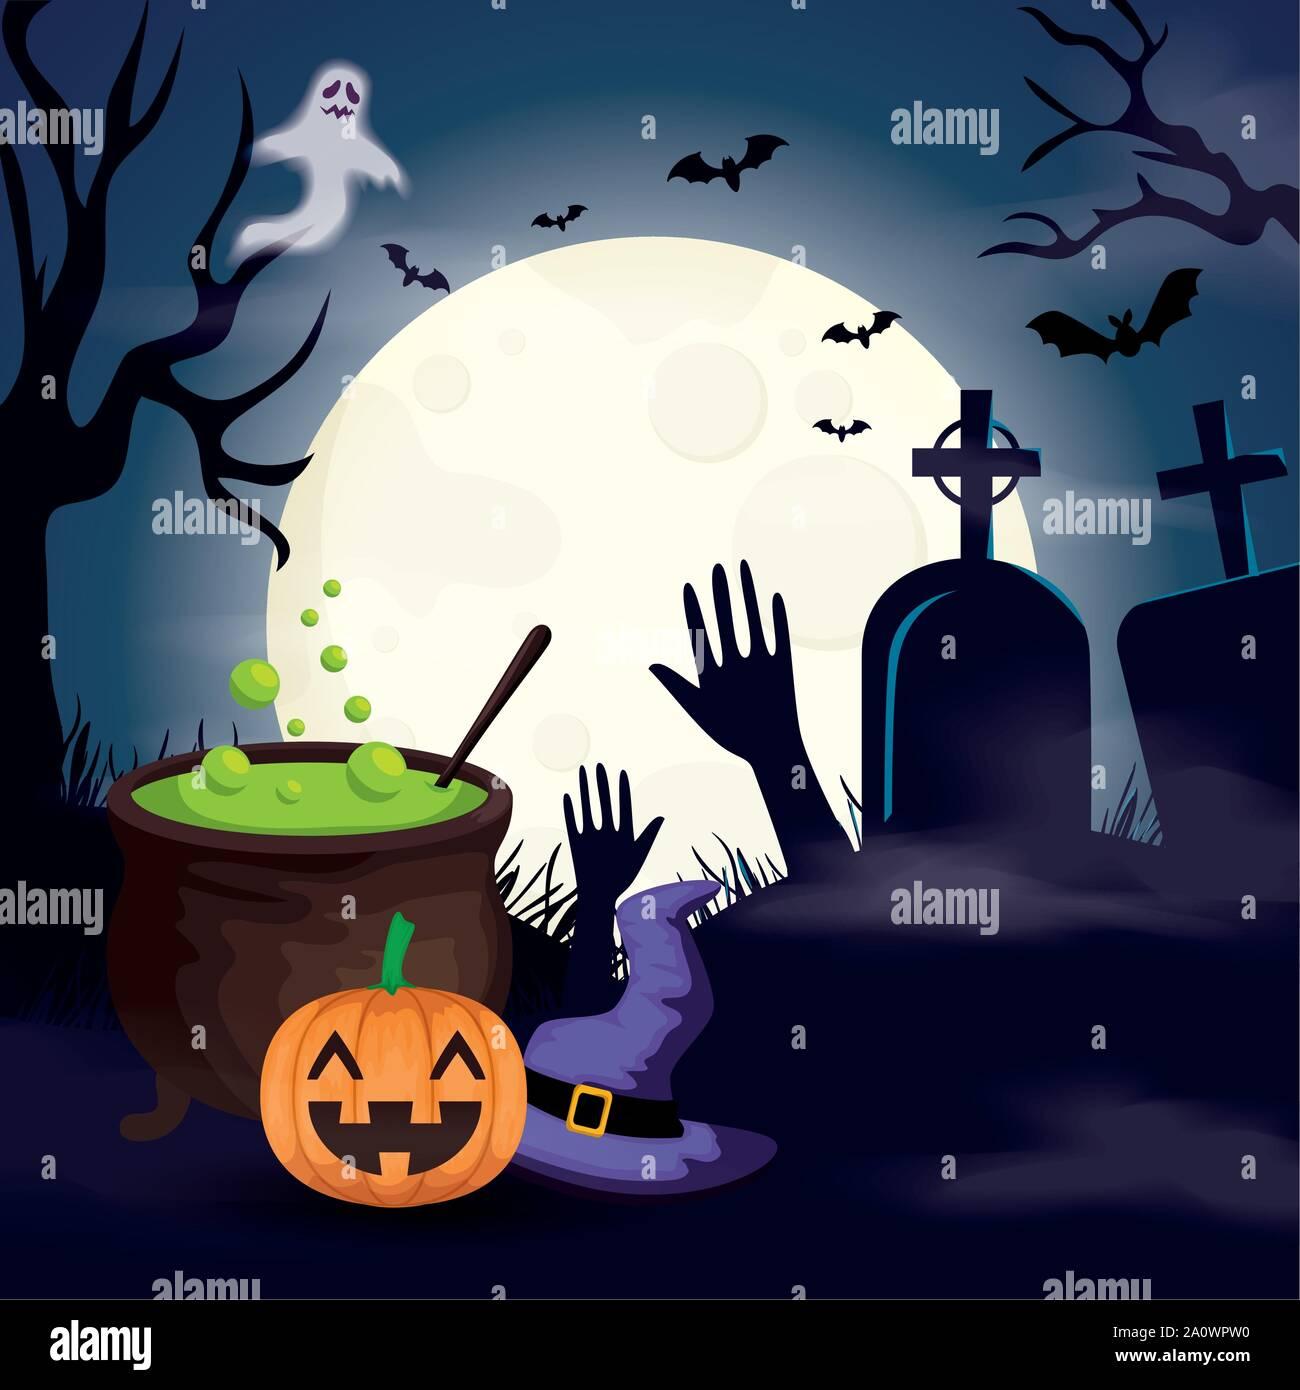 Witch Cauldron Photos Witch Cauldron Images Page 9 Alamy